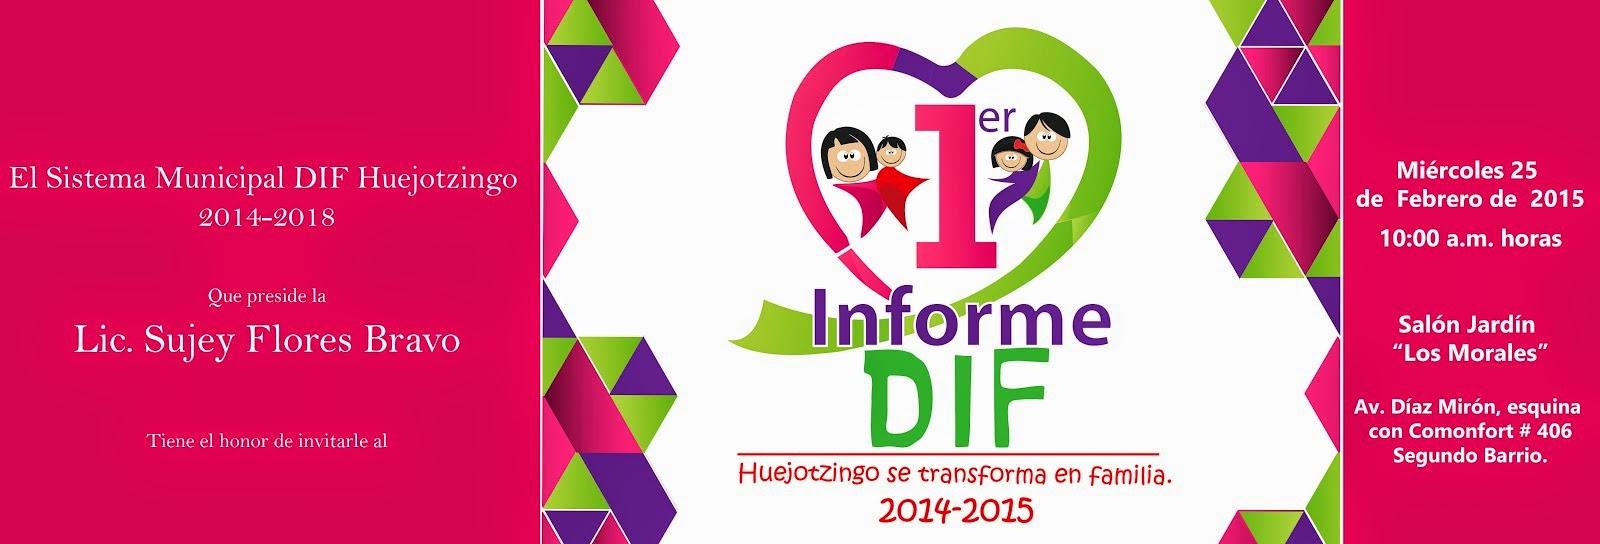 Informe del SMDIF Huejotzingo